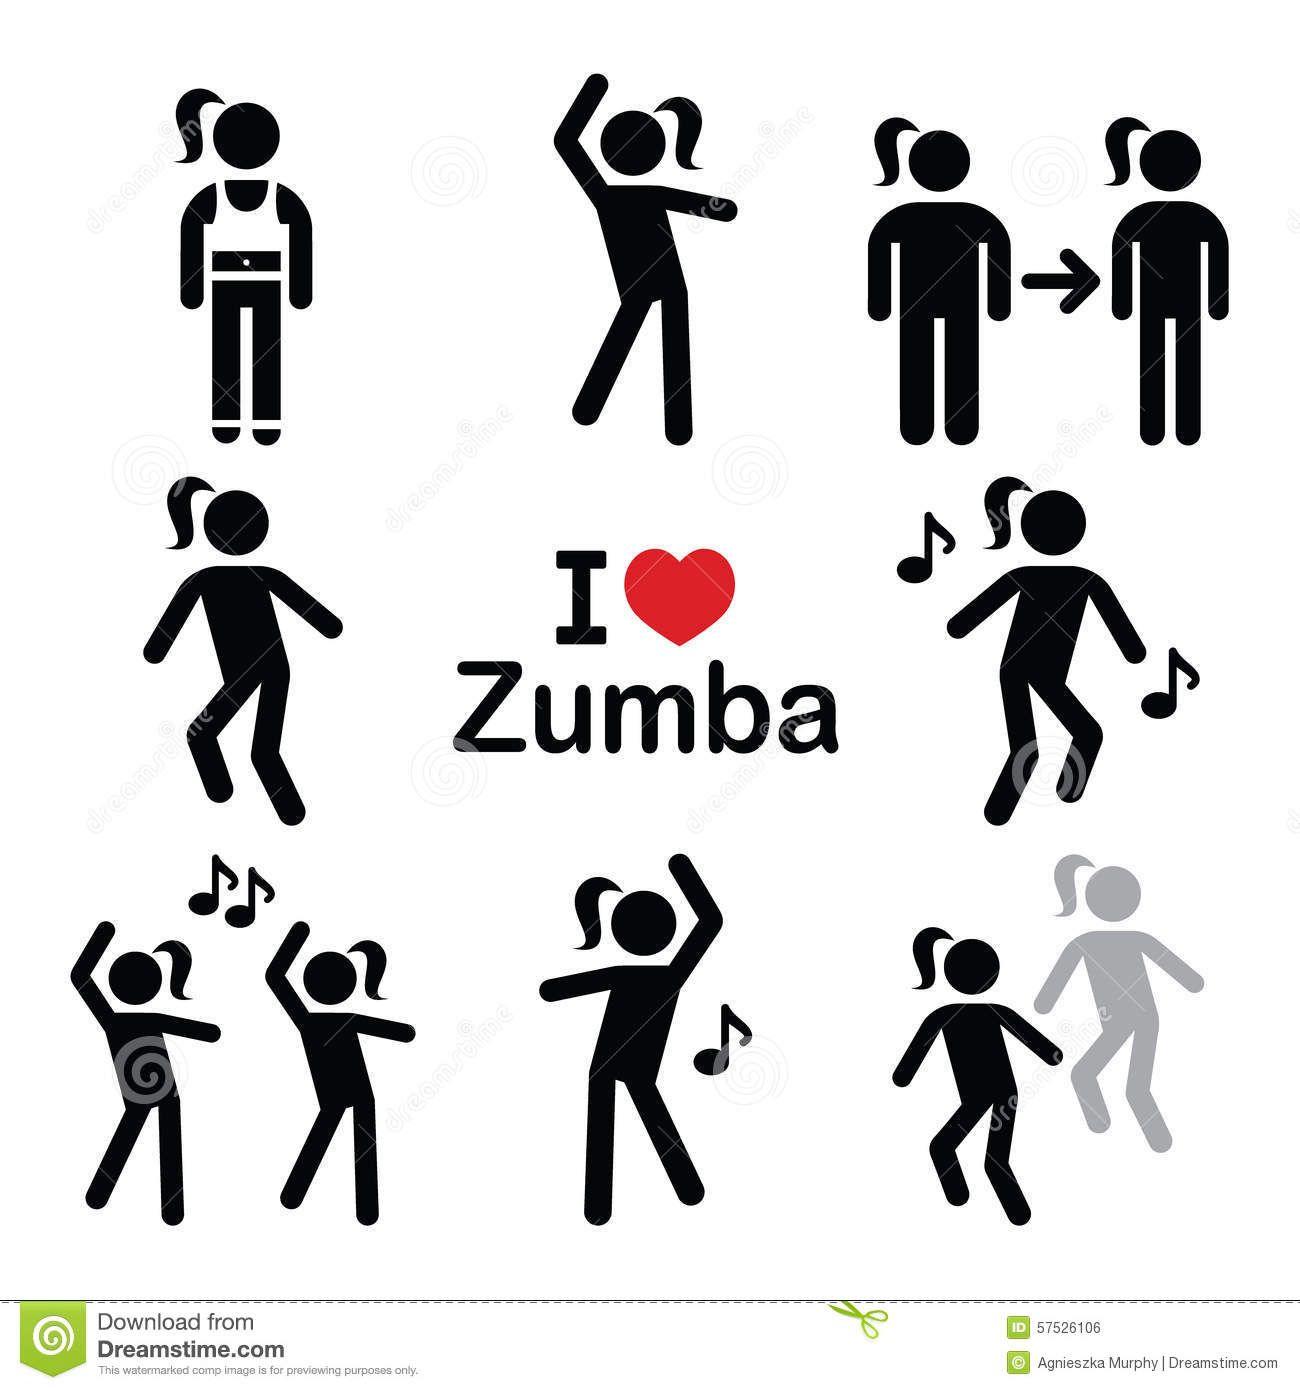 Fitness Zumba Dance Workout Gym Stock Photos Images Pictures 452 Images Zumba Zumba Dance Workouts Fitness Icon